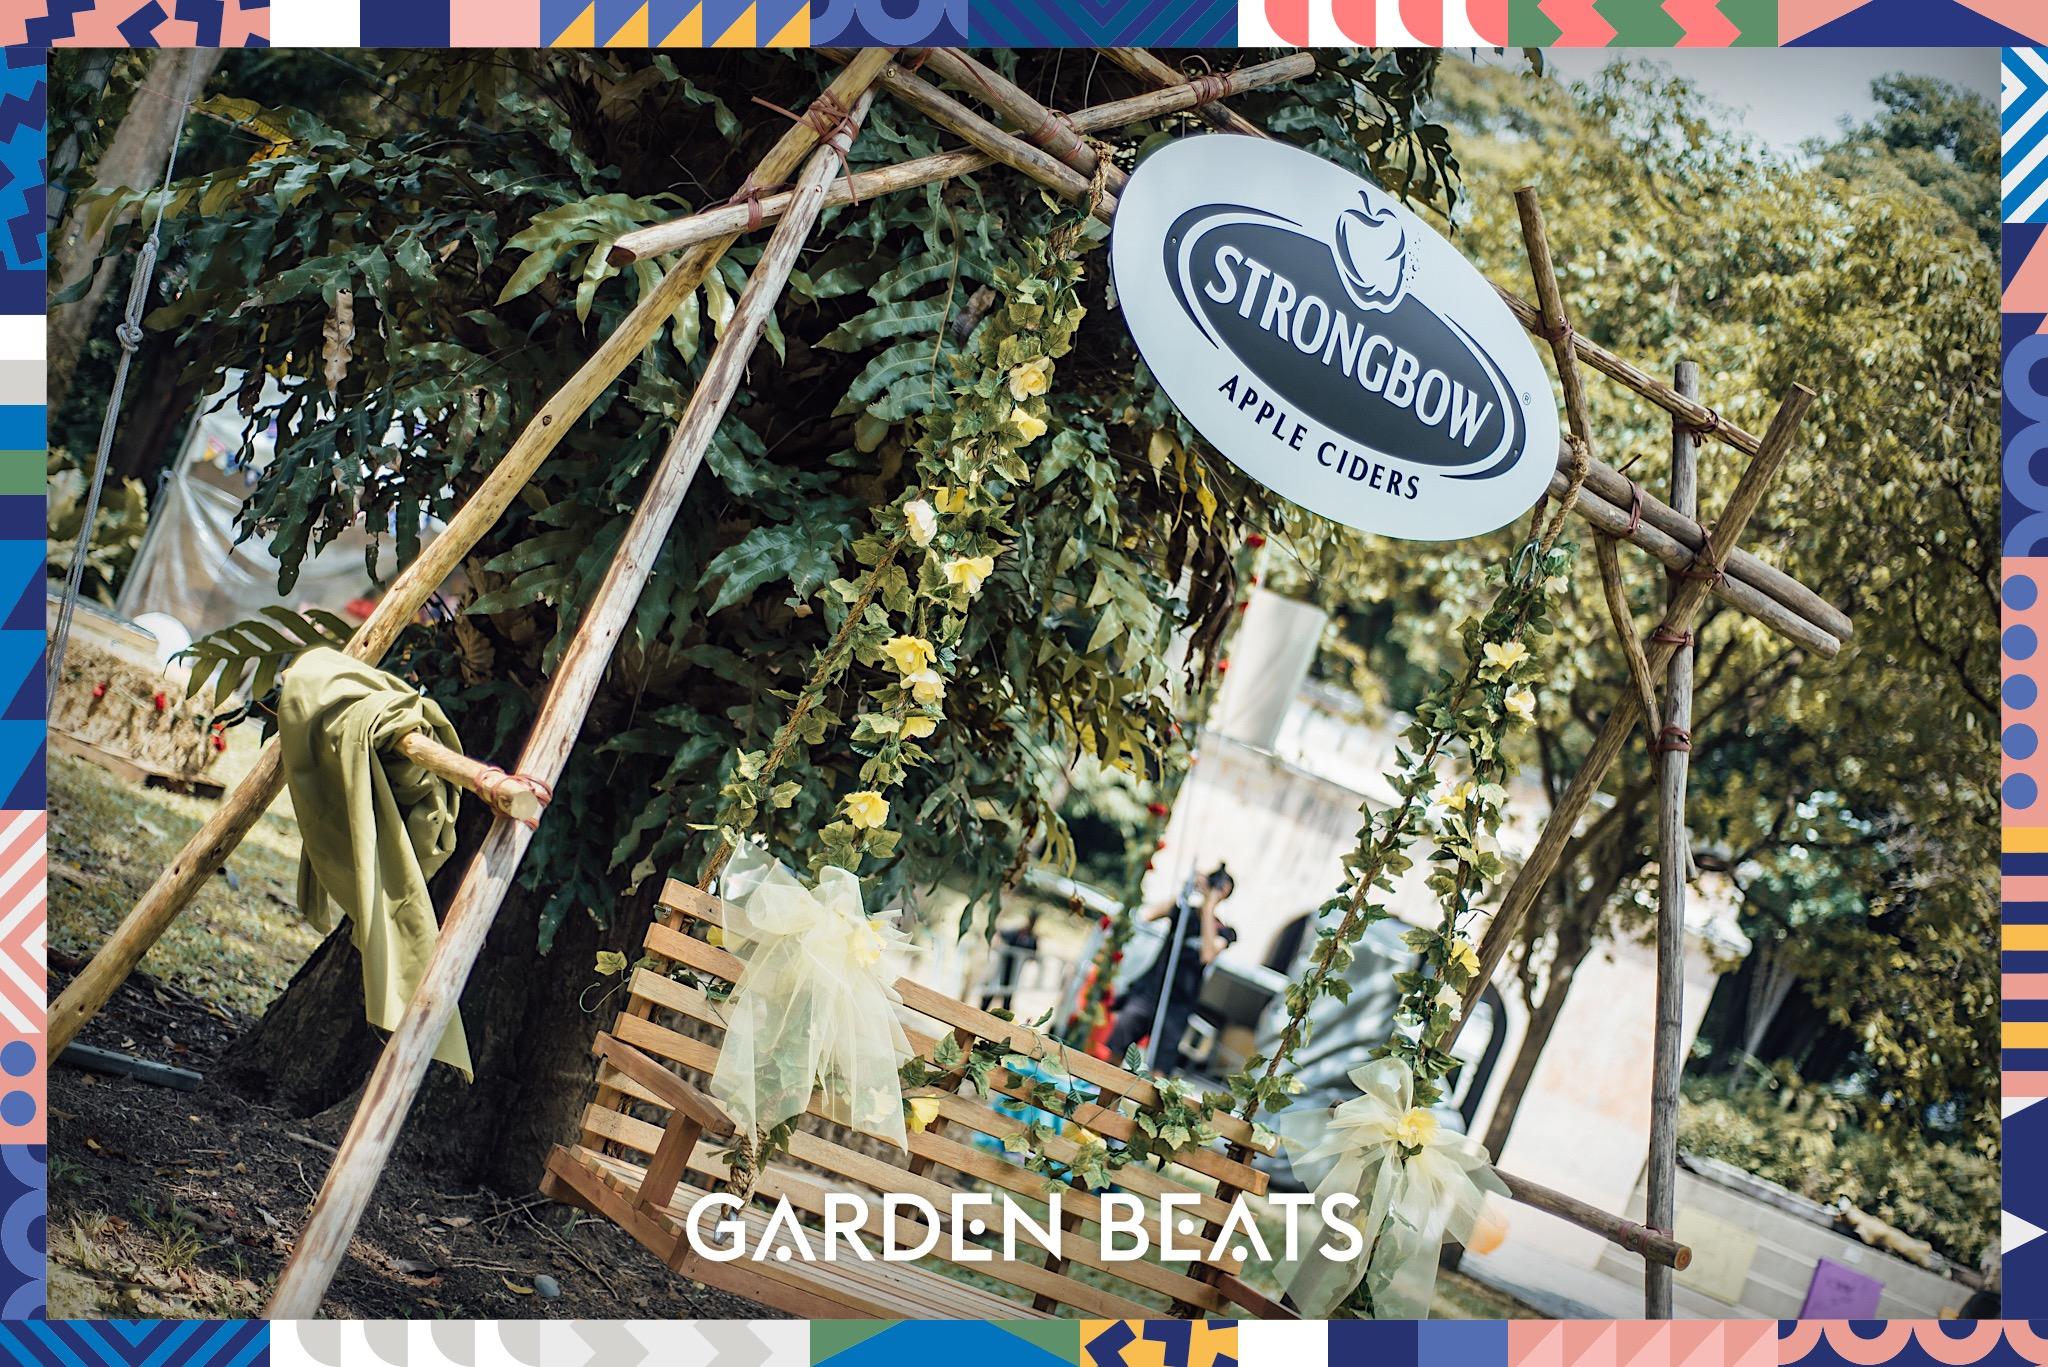 18032017_GardenBeats_Colossal003_WatermarkedGB.jpg